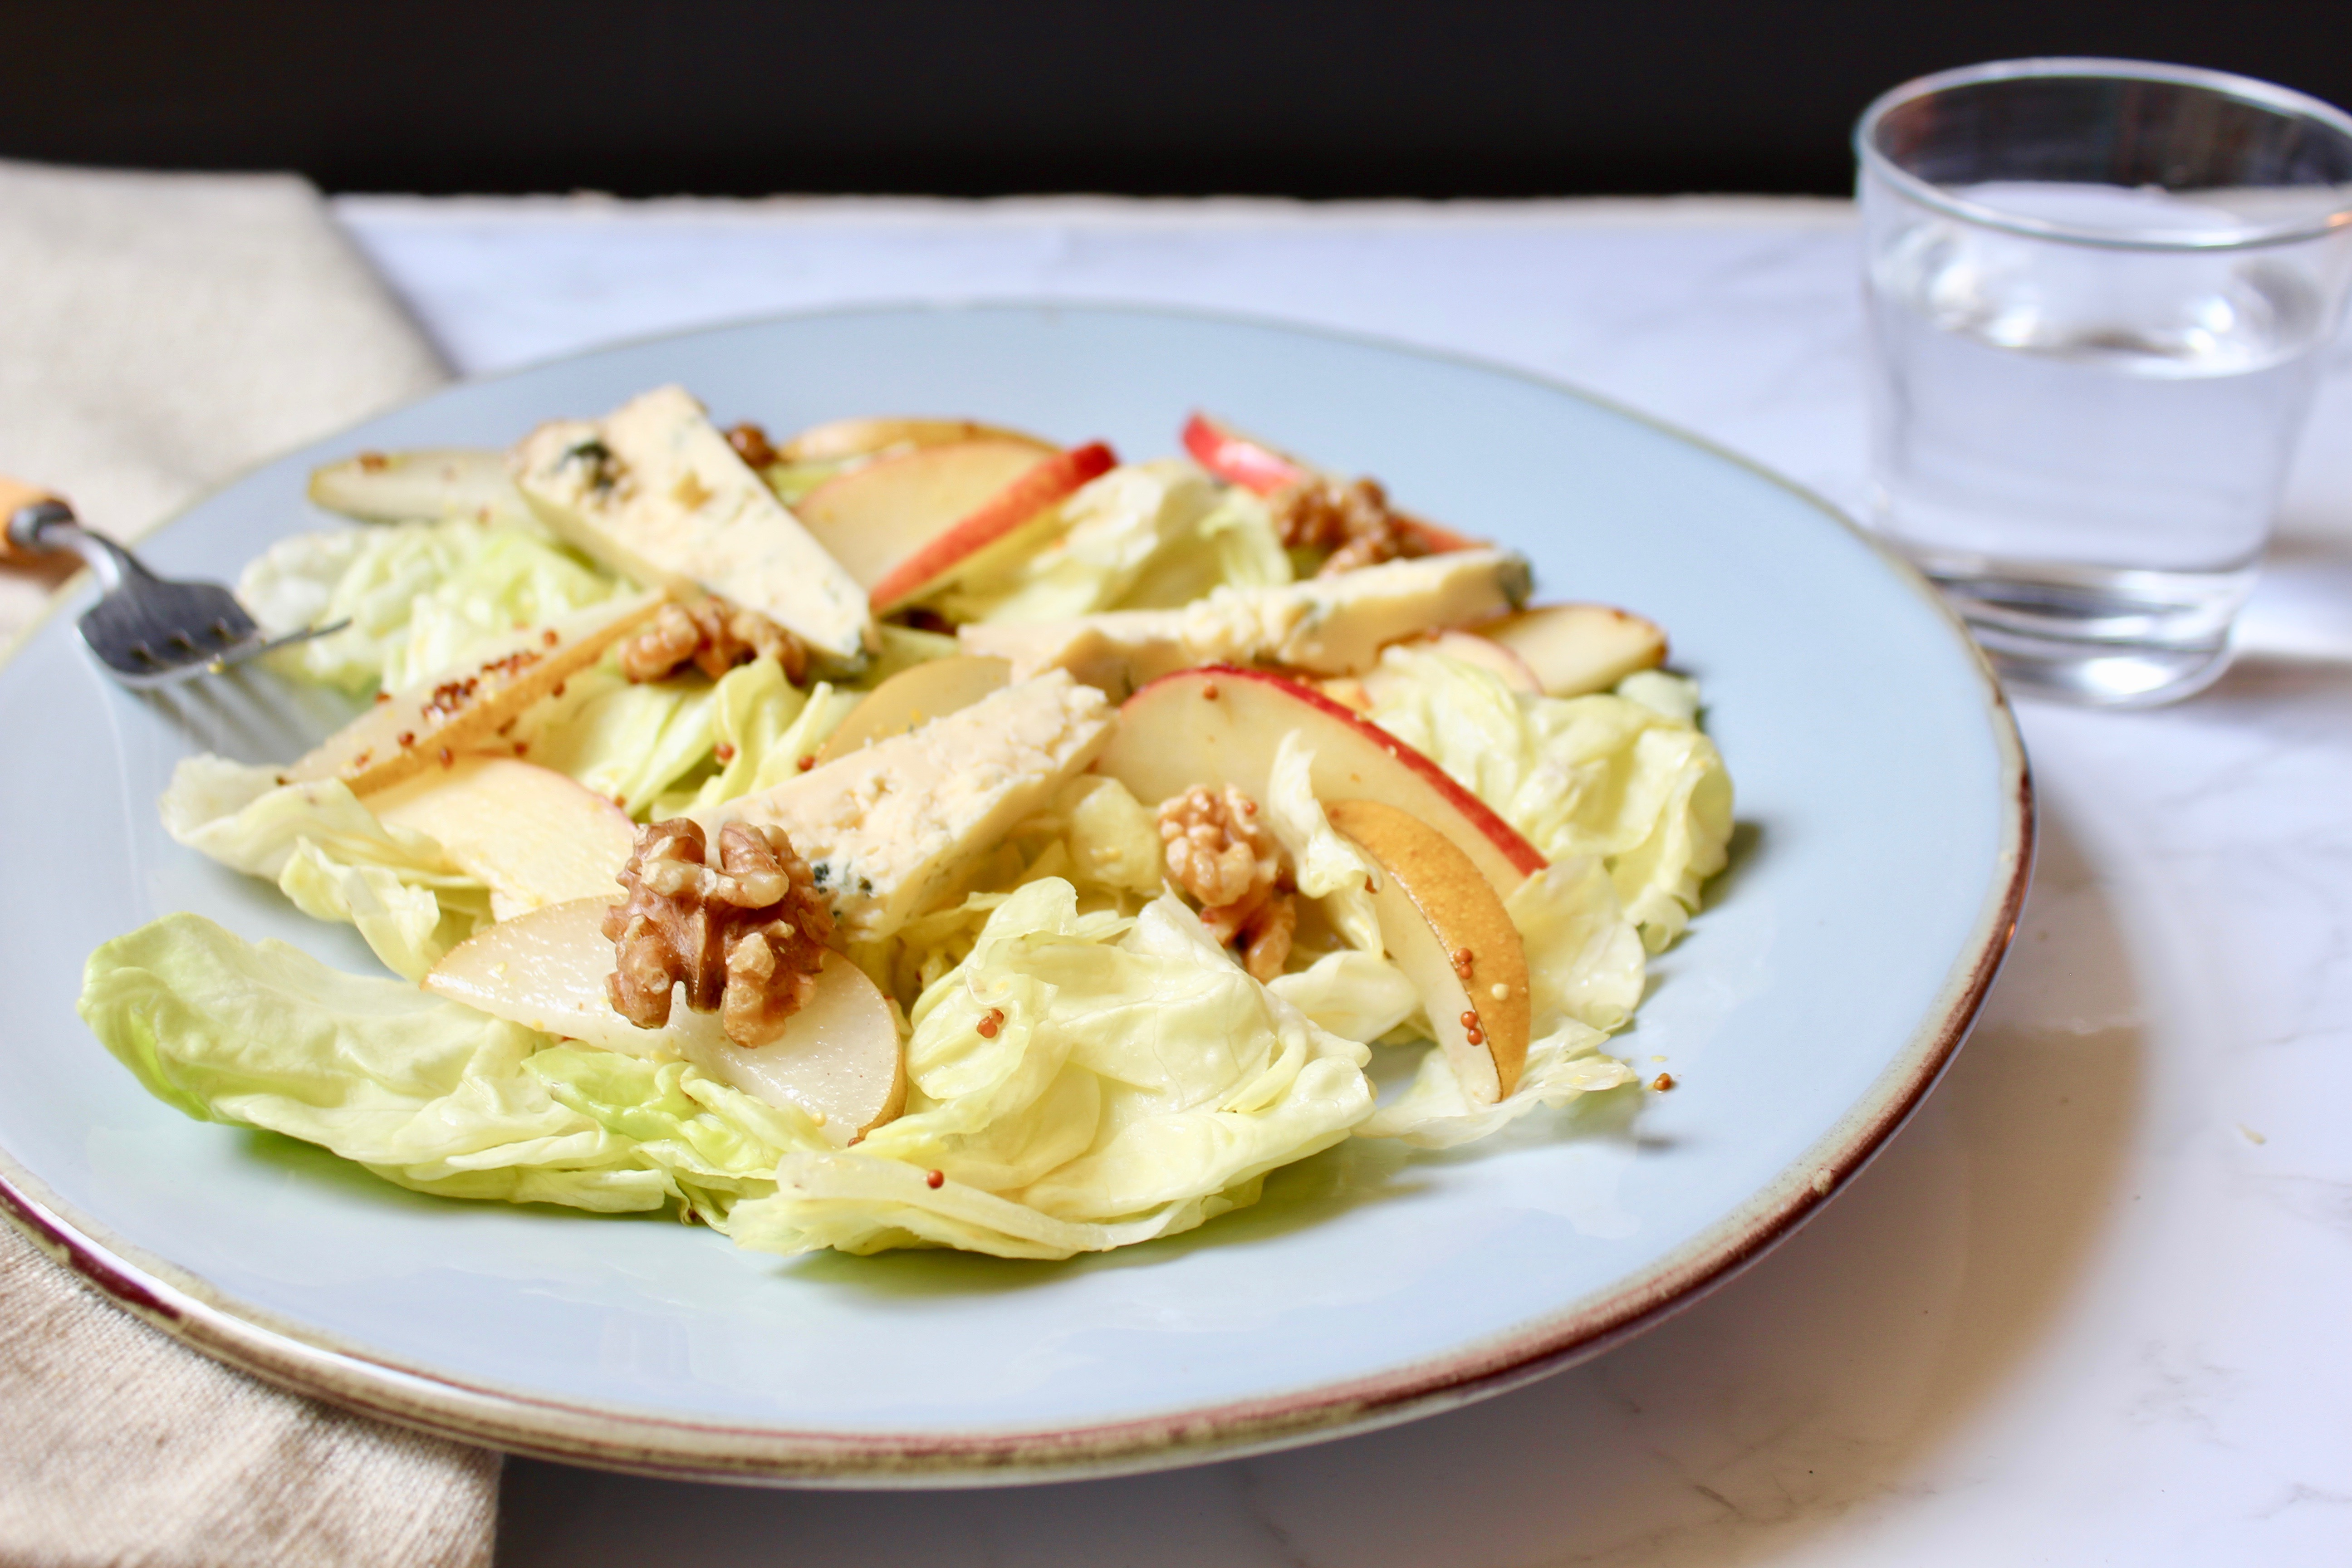 salad close-up